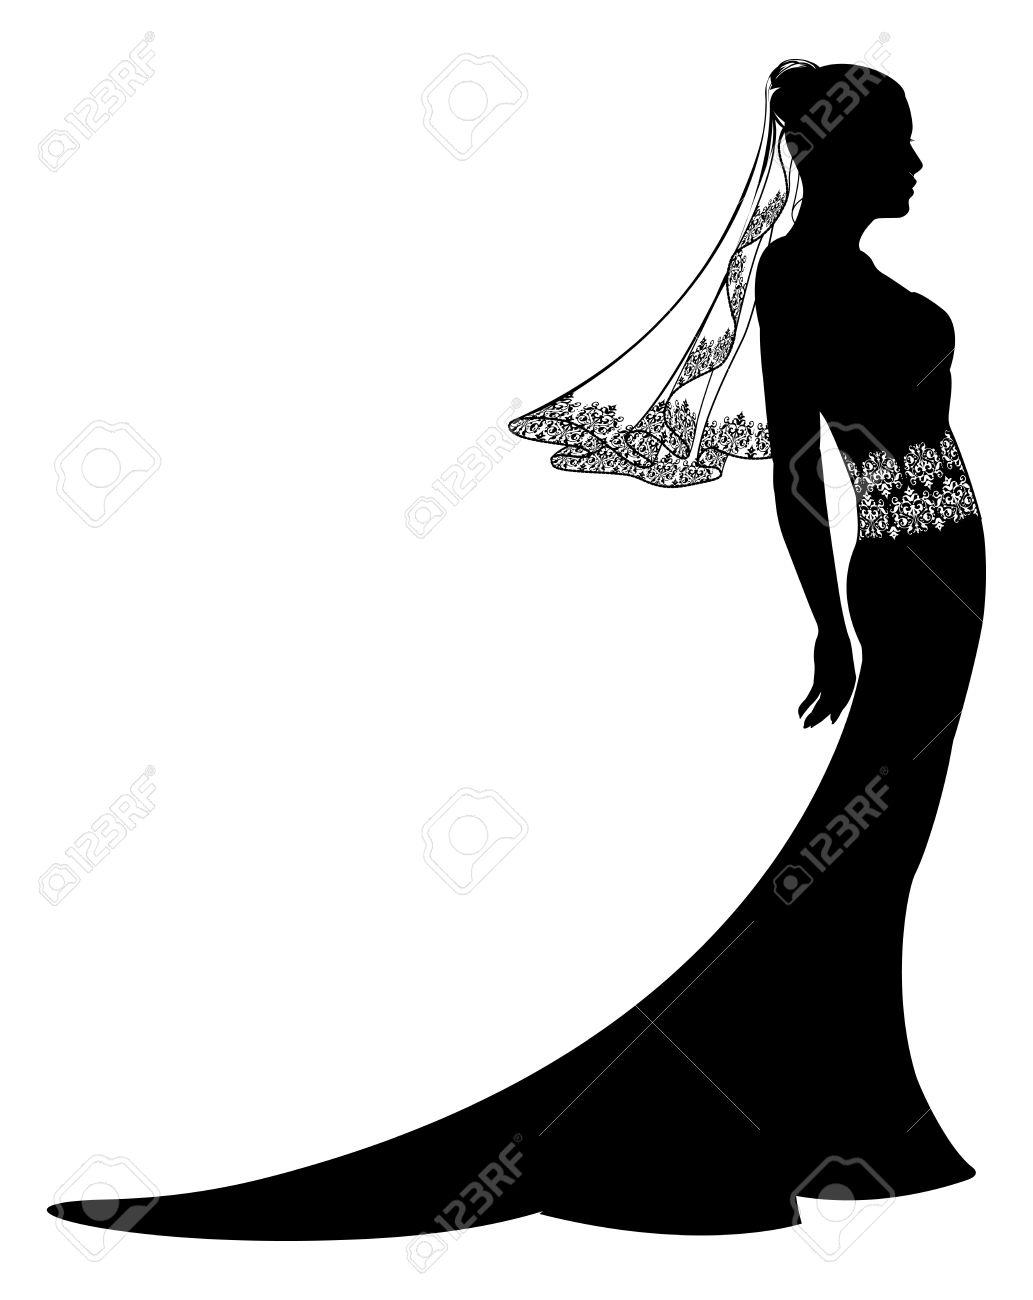 1033x1300 Wedding Dress And Bouquet Bride Silhouette Stock Vector Art